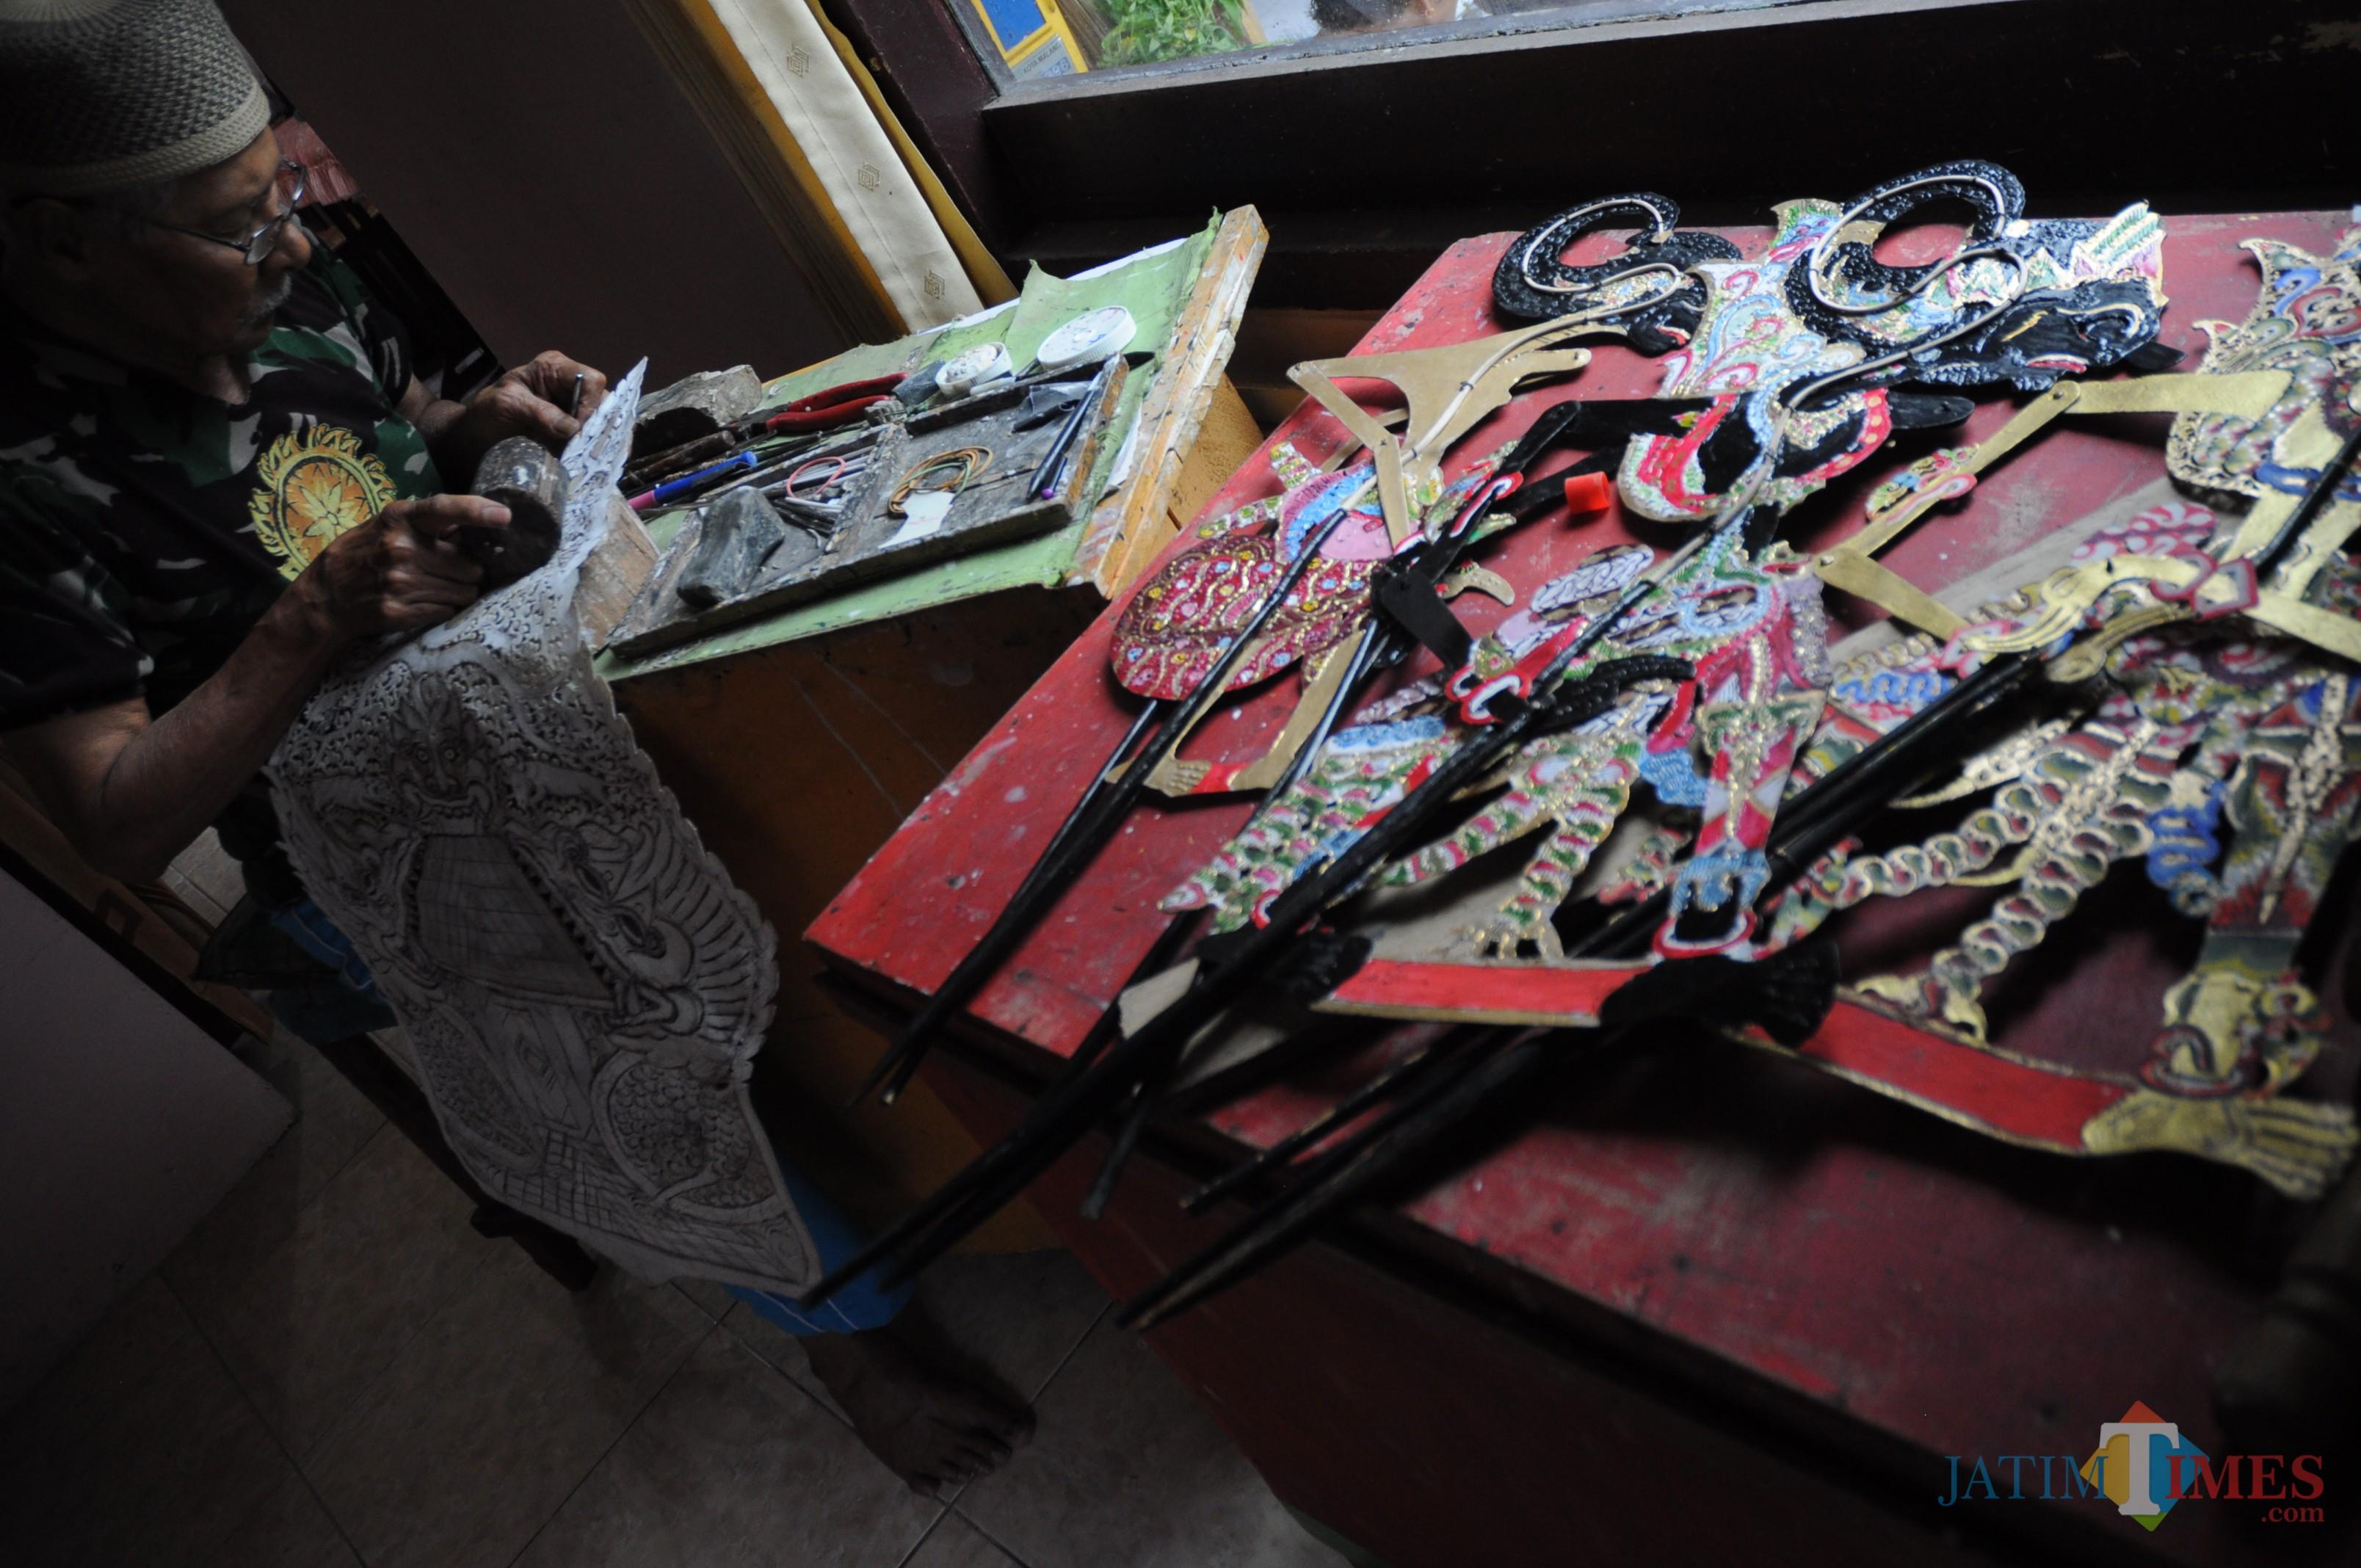 Proses pembuatan wayang kulit oleh Rachmad Susmedi (Luqmanul Hakim/Malang Times)